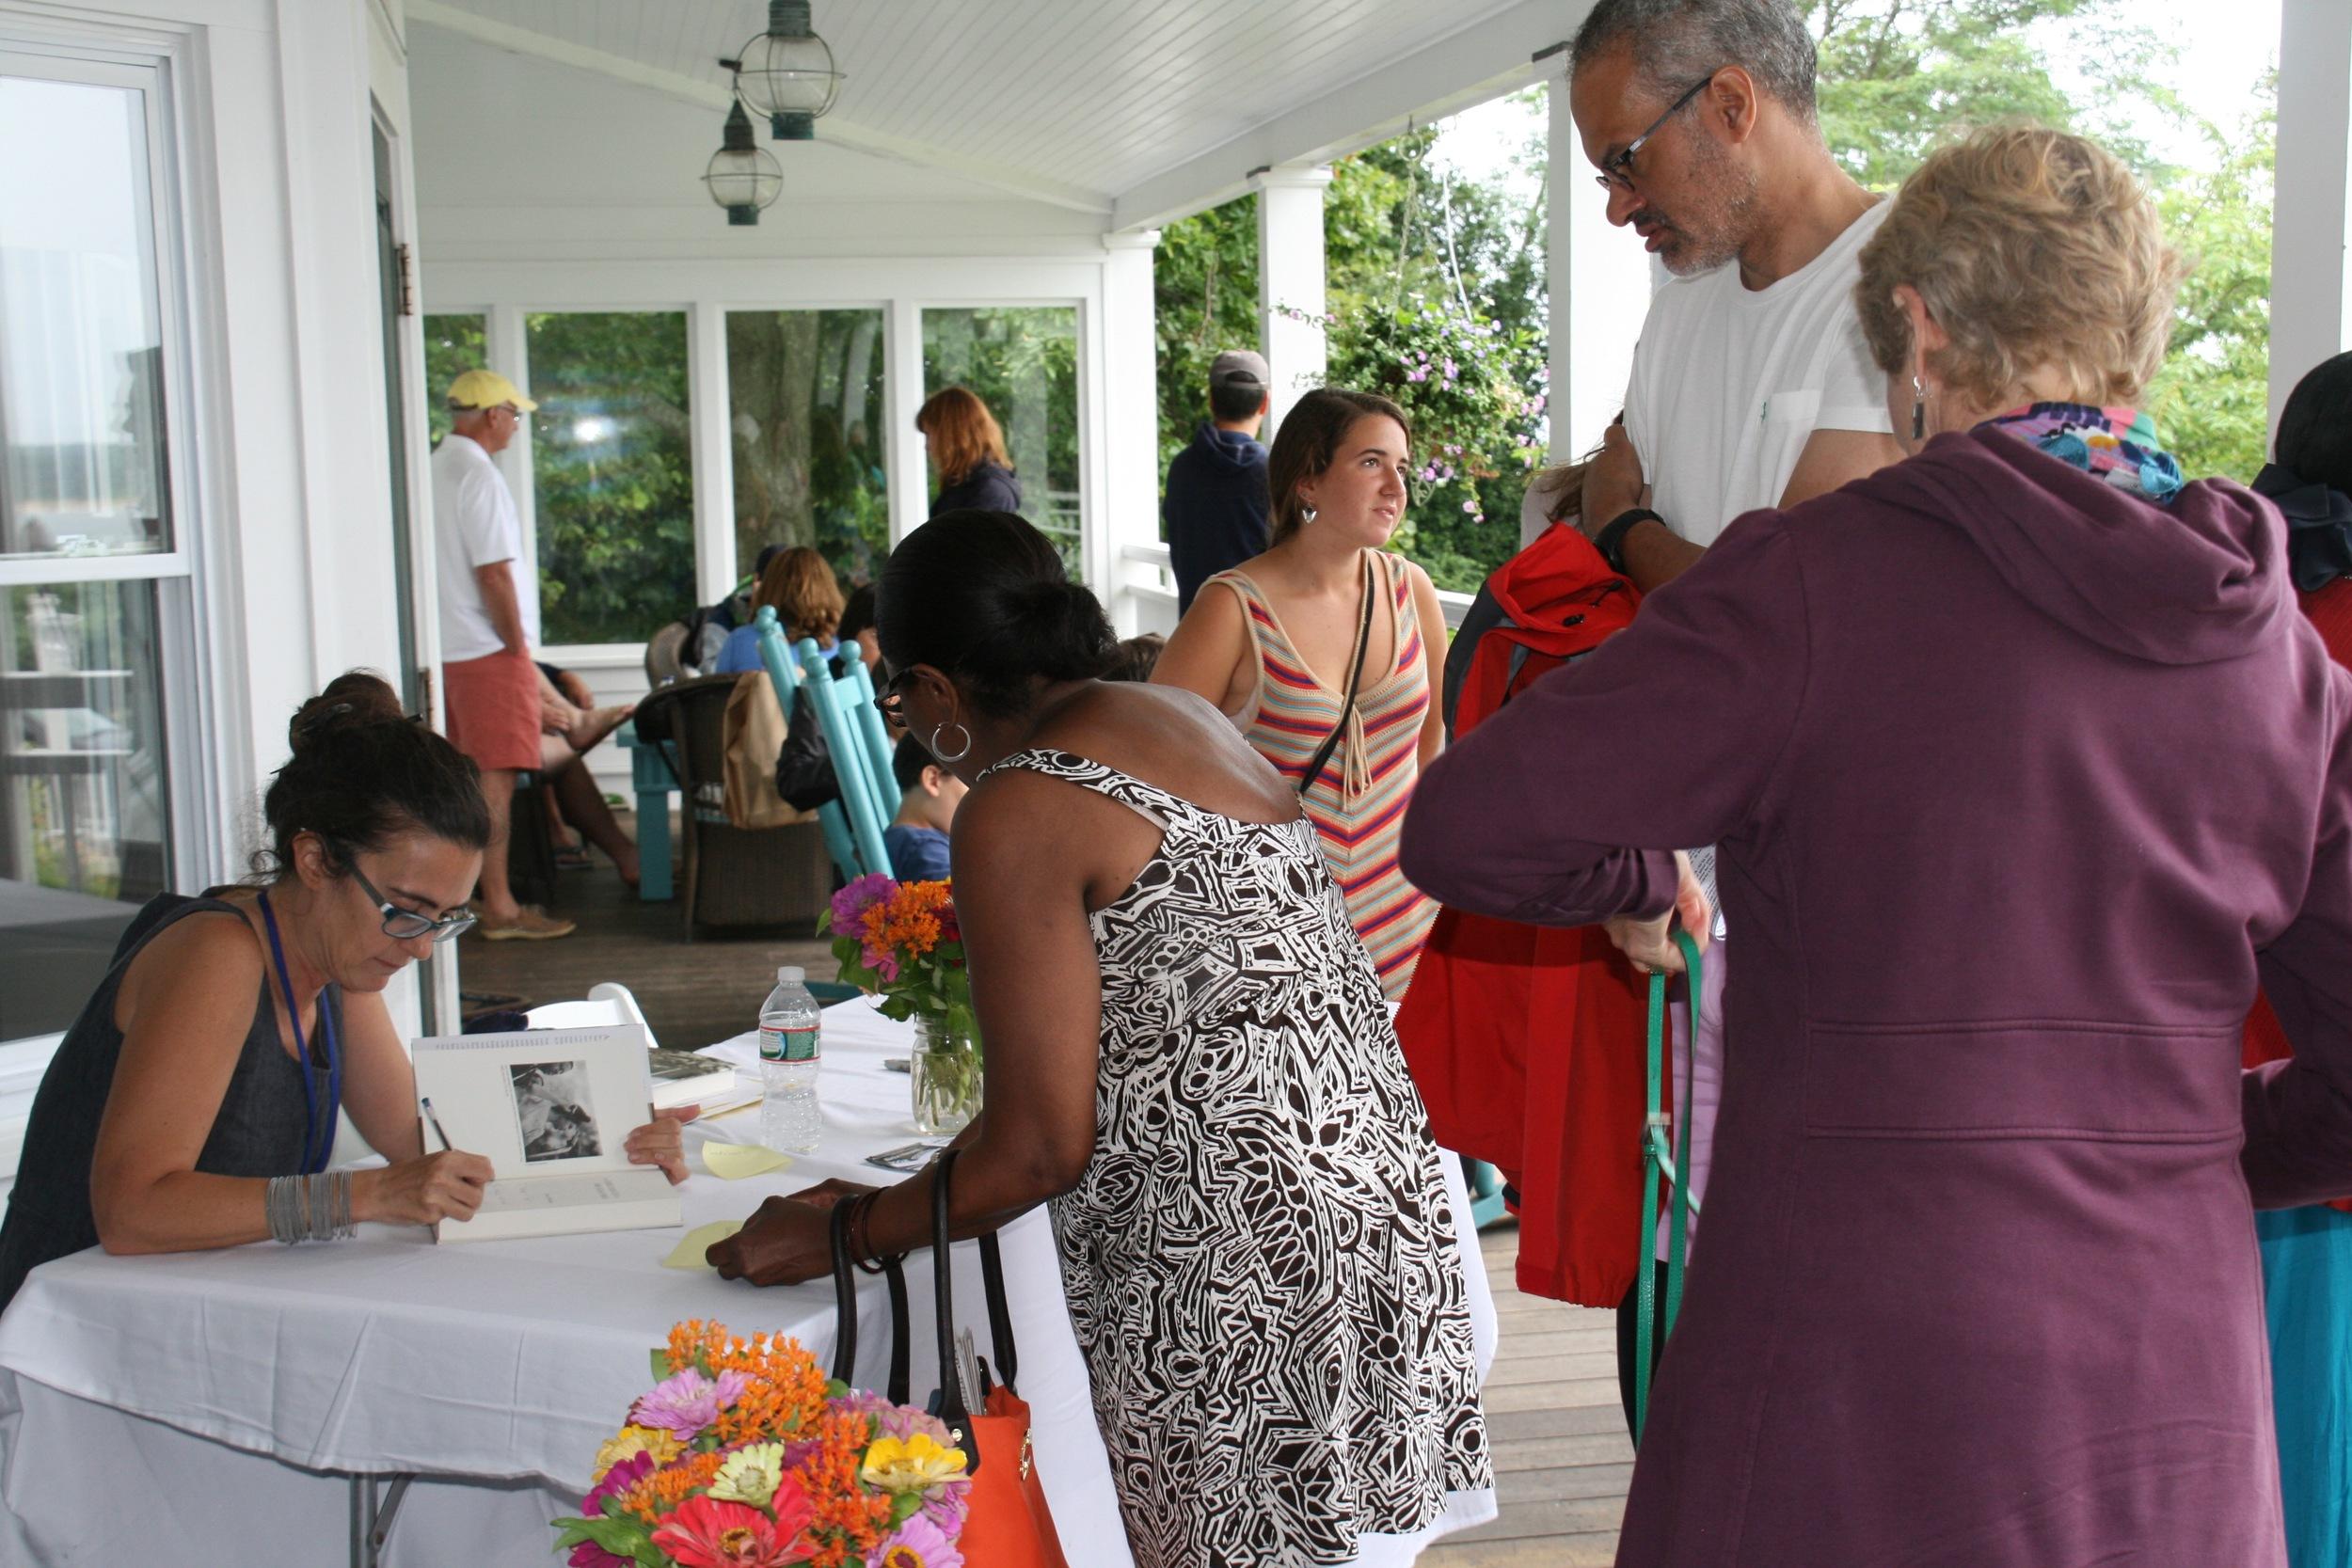 Jeanne Theoharis signing books 2013 Festival in Edgartown, credit W. Lazarus.jpg